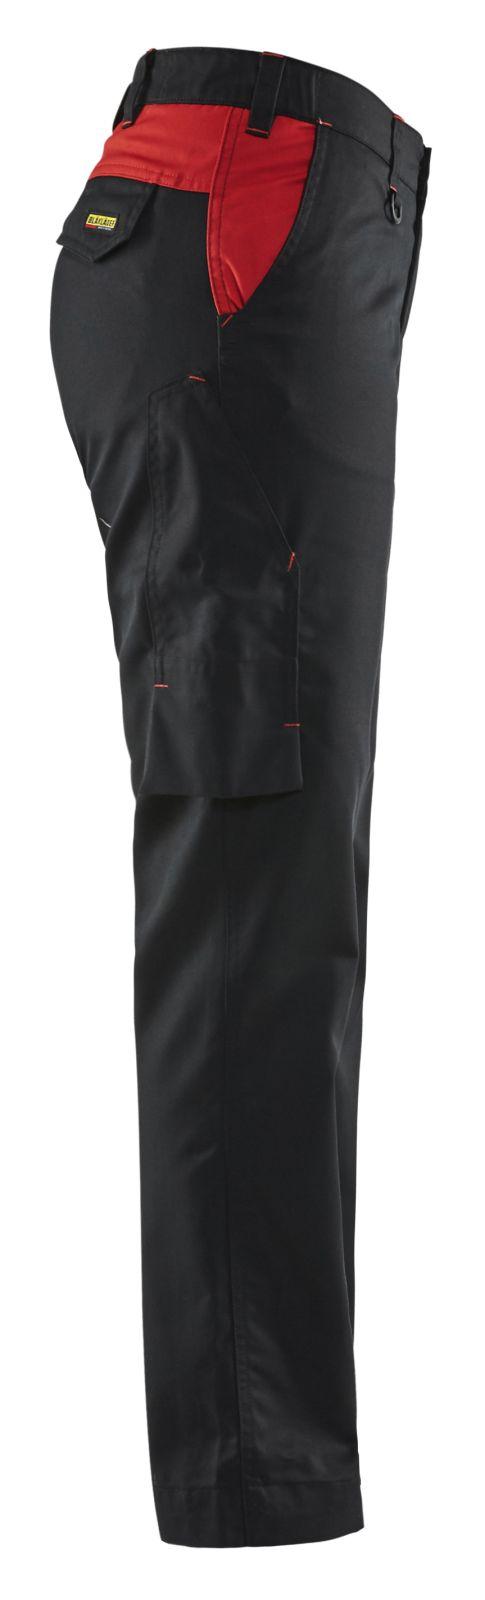 Blaklader Dames werkbroeken 71041800 zwart-rood(9956)